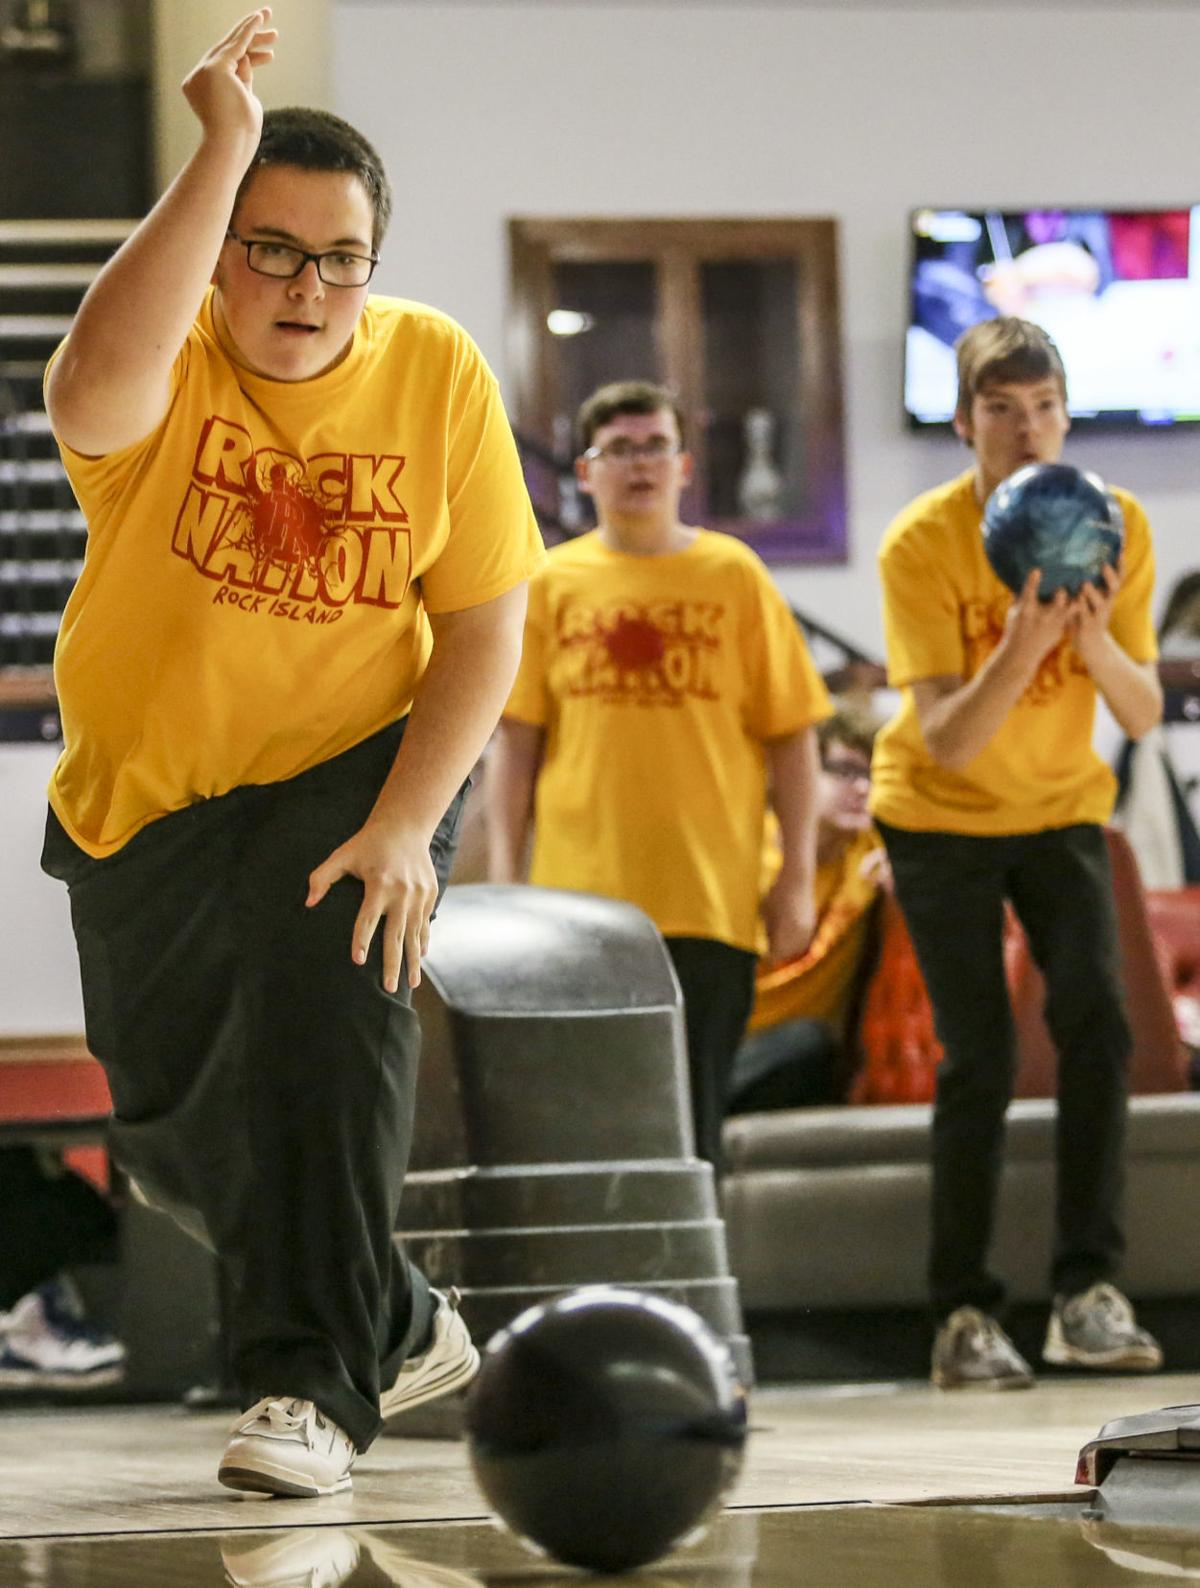 120419-mda-spt-rocky bowling-06.jpg